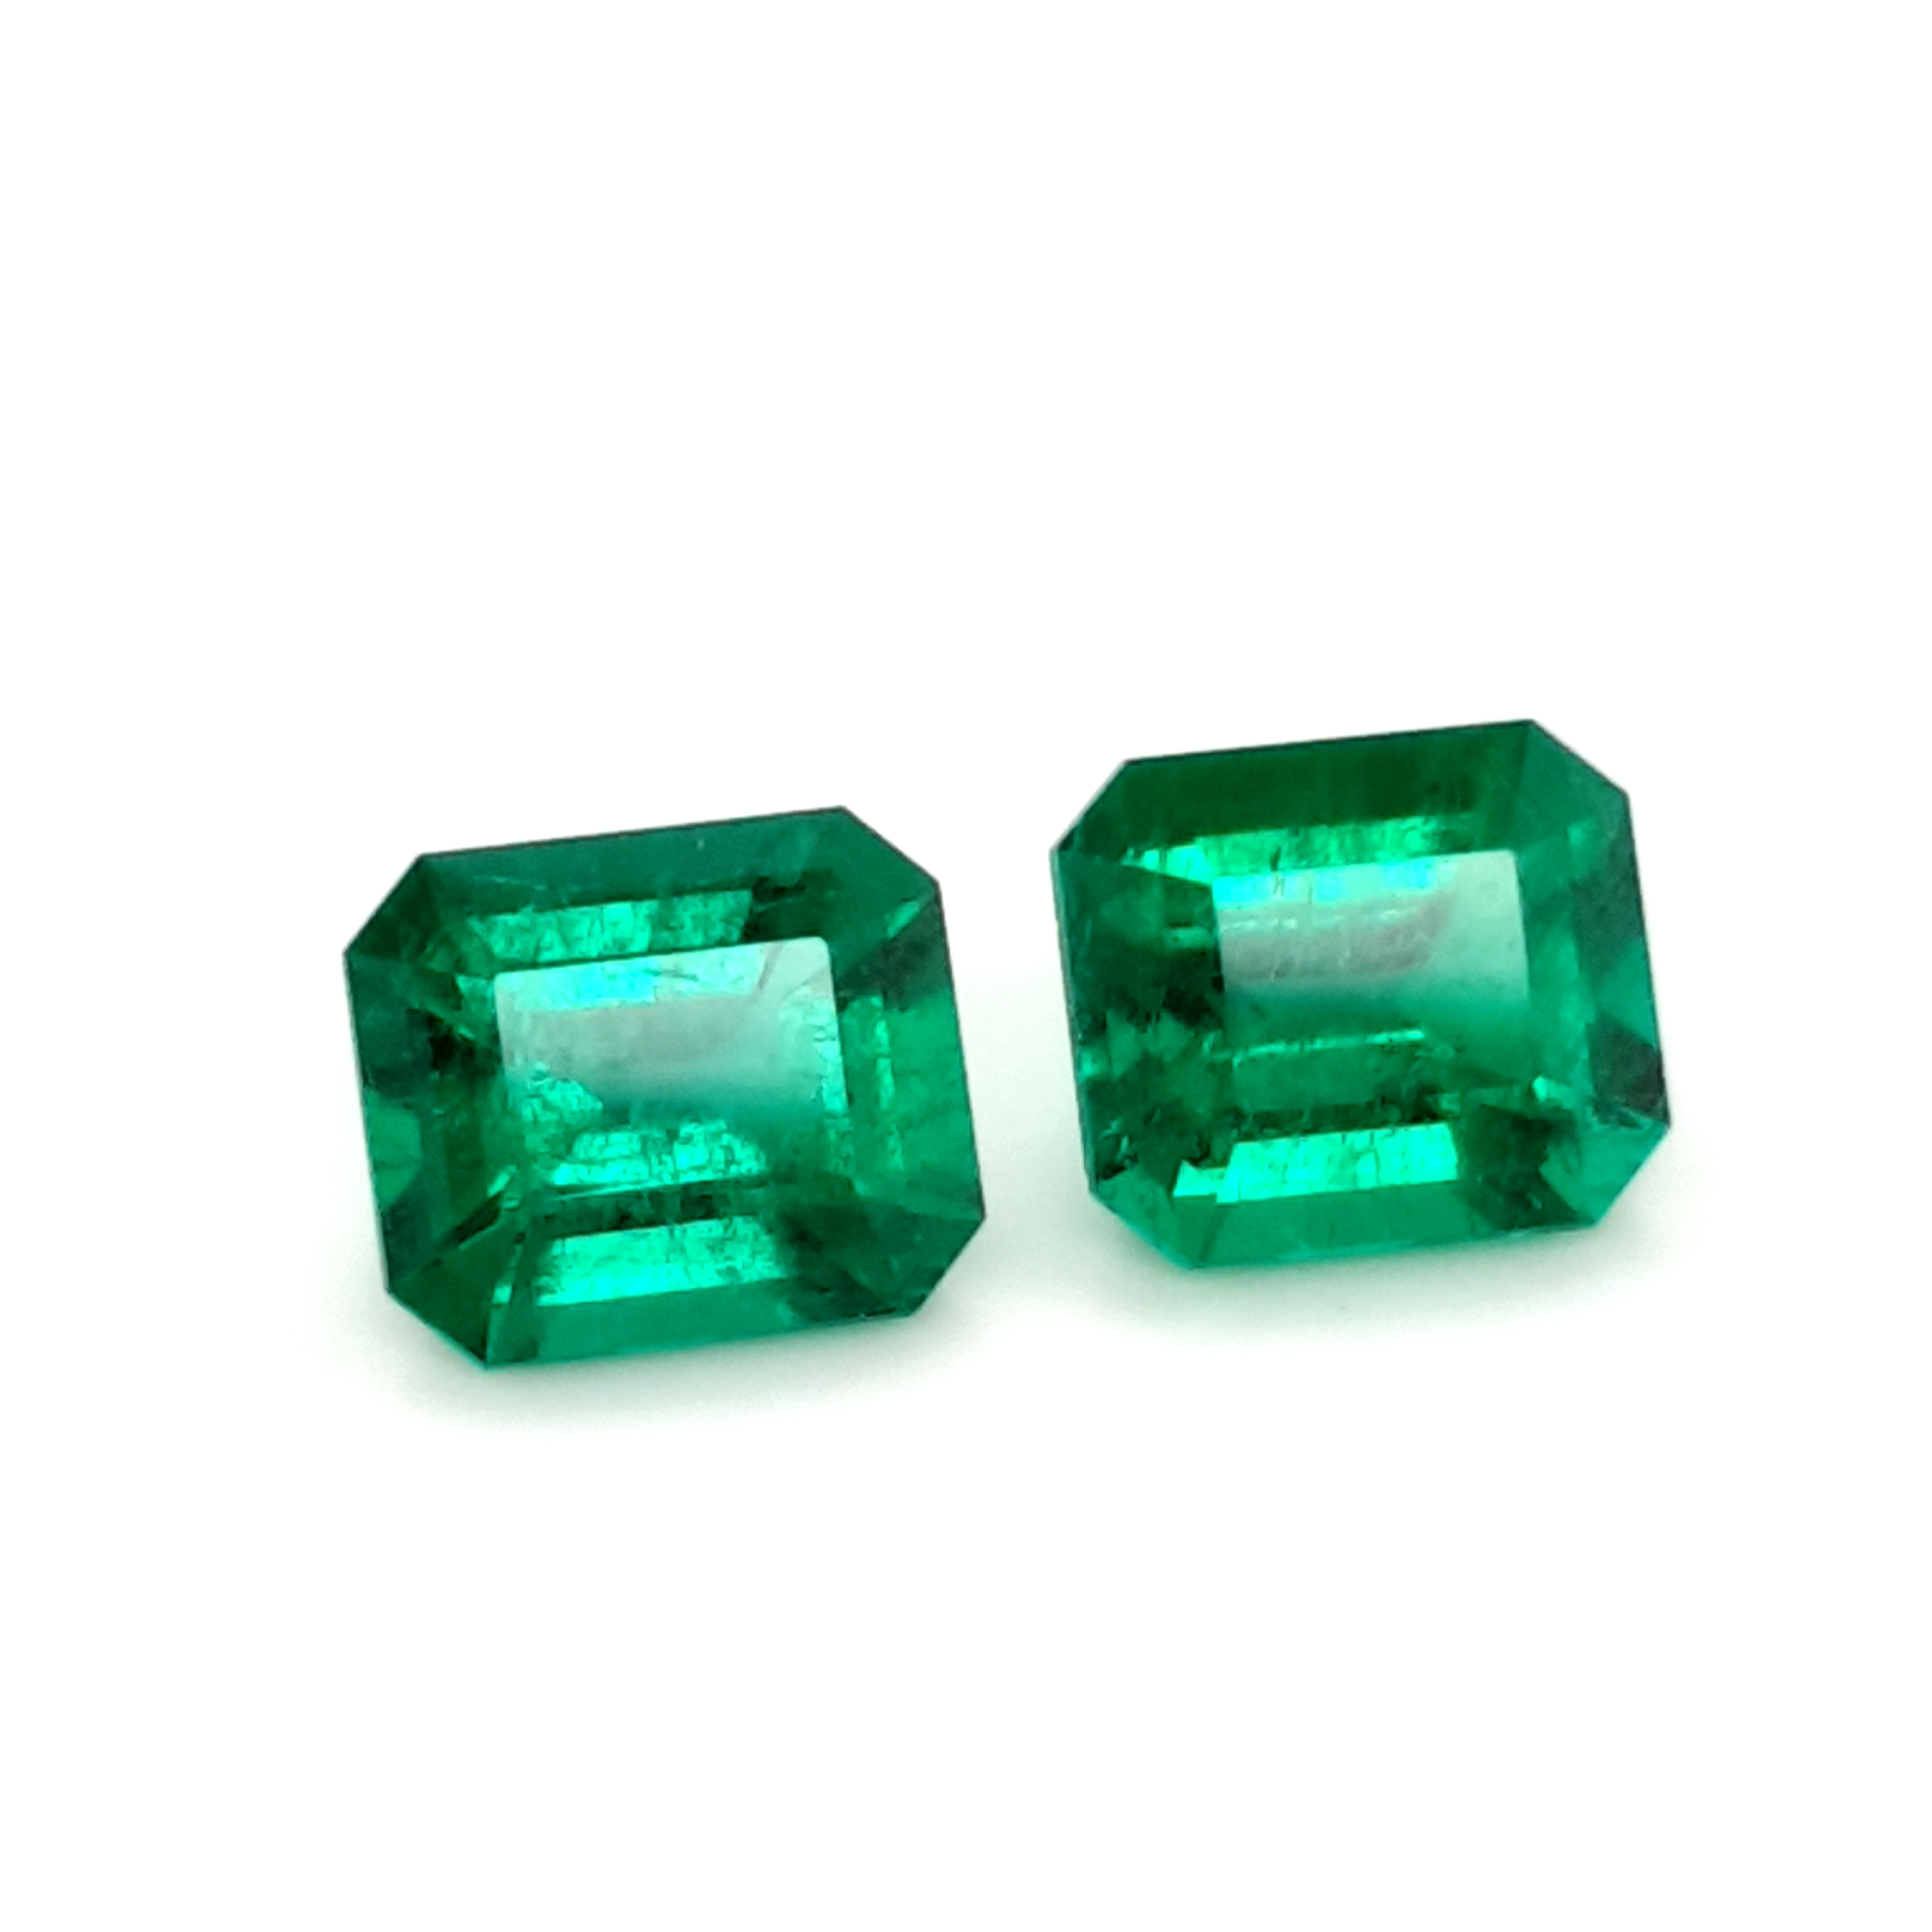 7,39ct. Pair Emerald from Colombia MuzoGreen cert. EML20D1 ClaudiaHamann__2021-03-25-17-23-21